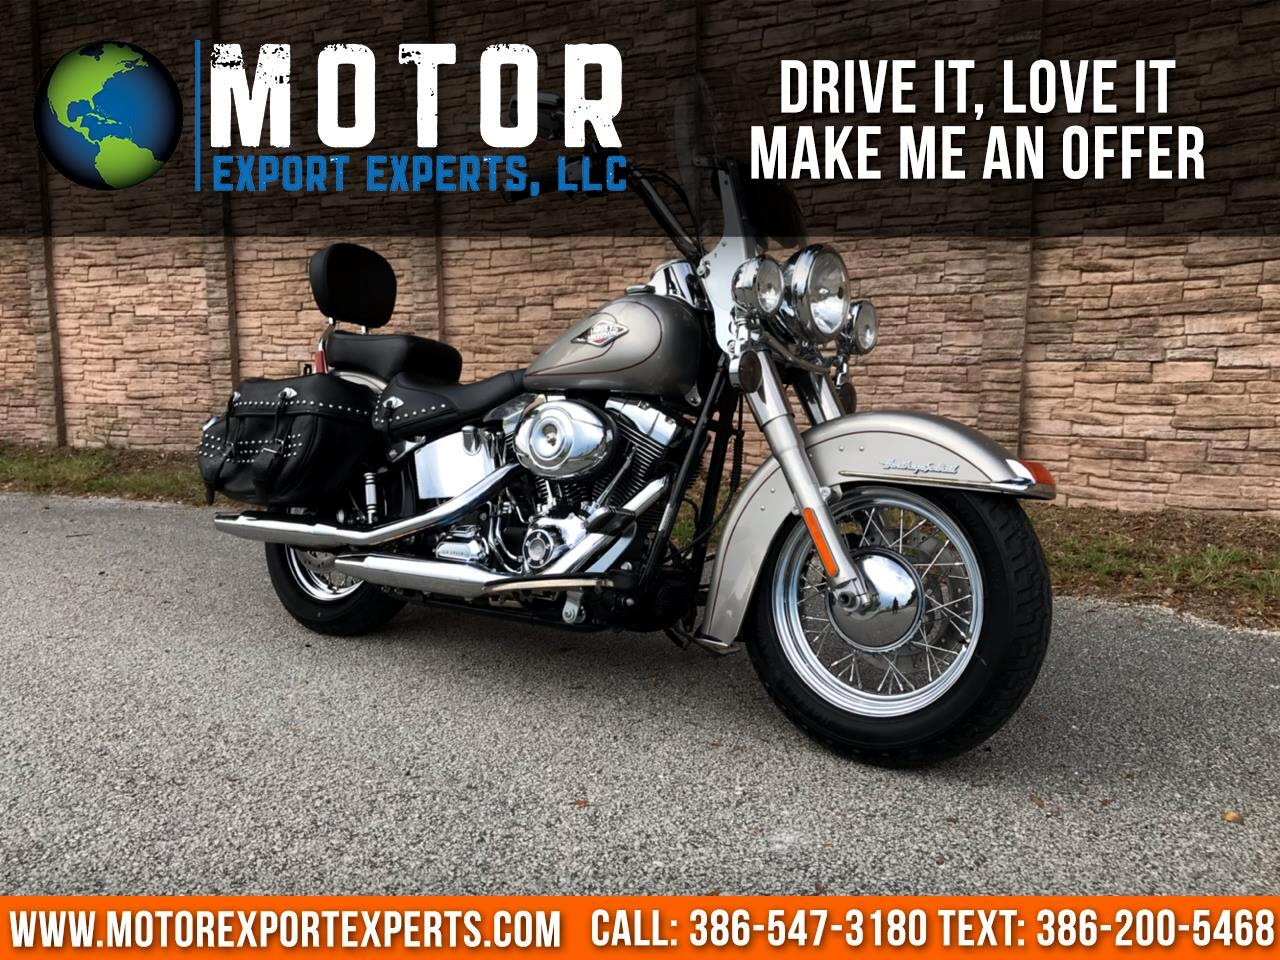 2009 Harley-Davidson FLSTC HERITAGE CLASSIC